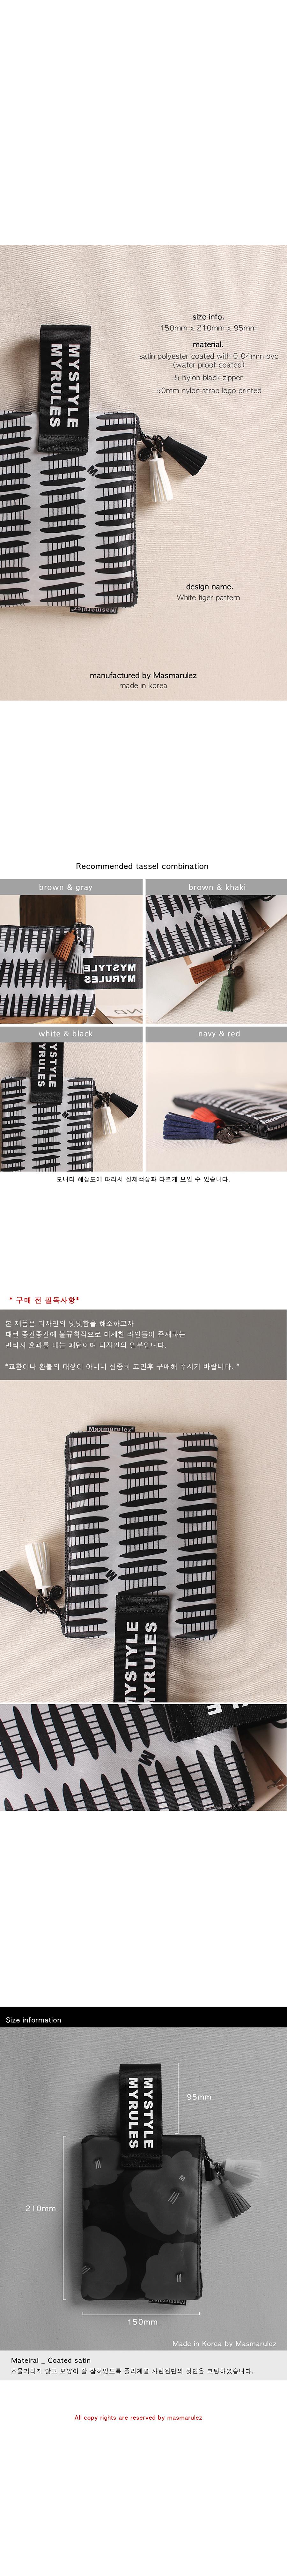 White tiger 마약 스트랩 파우치 - 마스마룰즈, 13,520원, 다용도파우치, 지퍼형